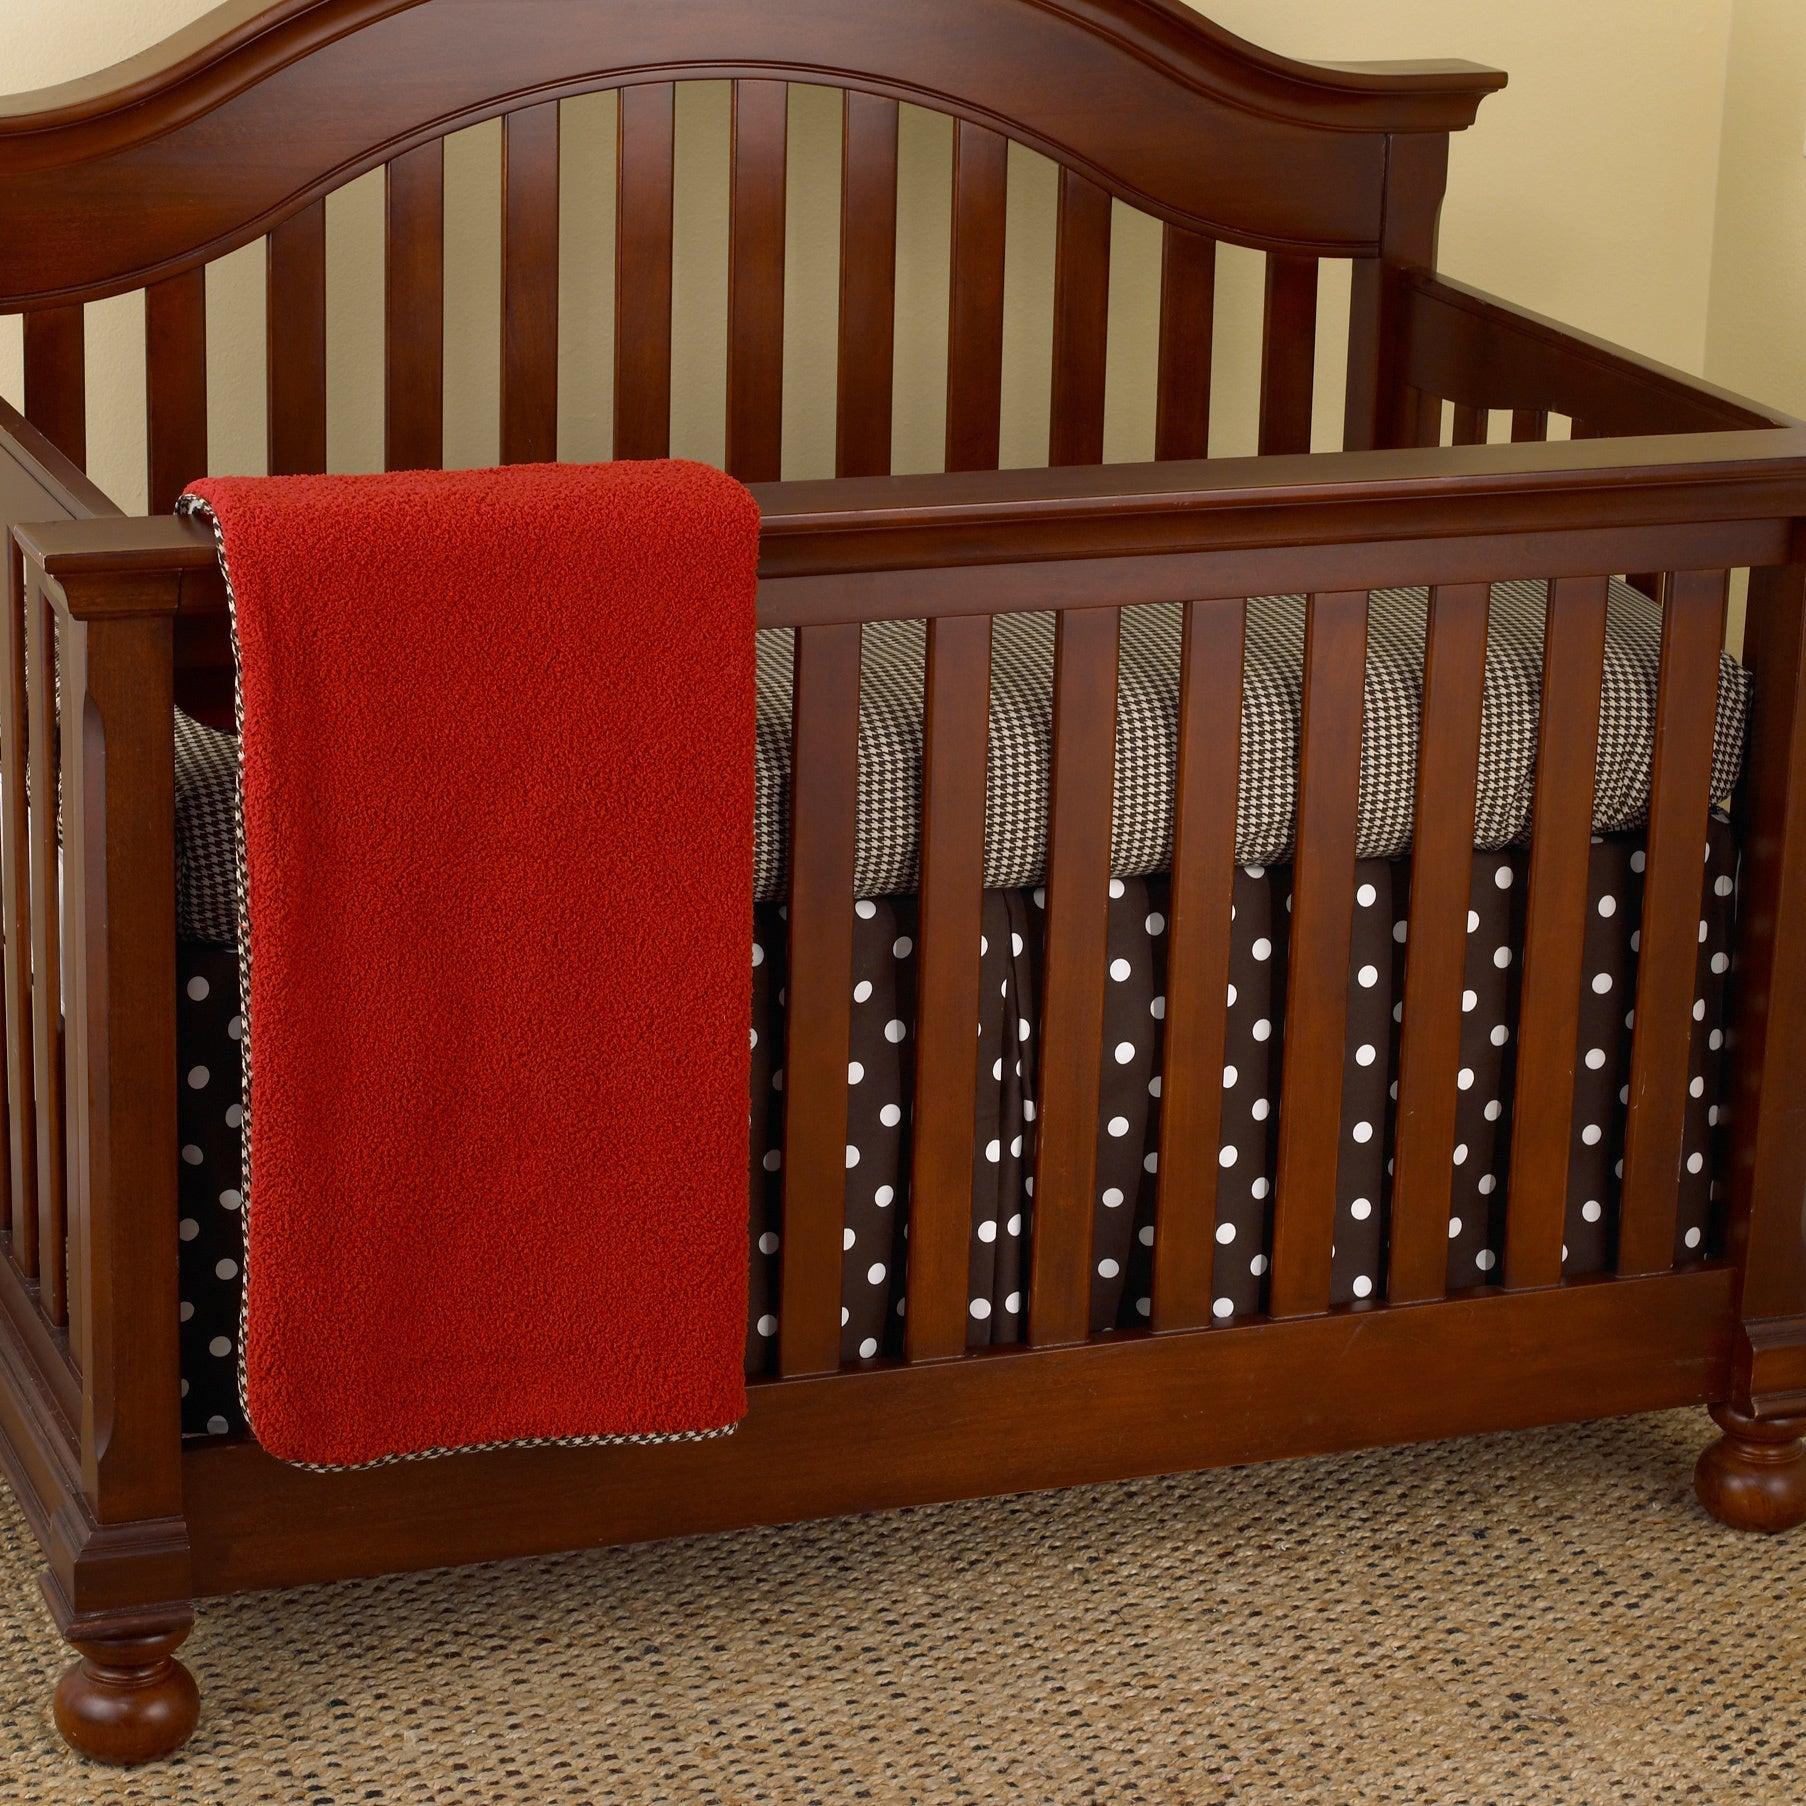 Cotton Tale Houndstooth 7-piece Crib Bedding Set (Cotton ...